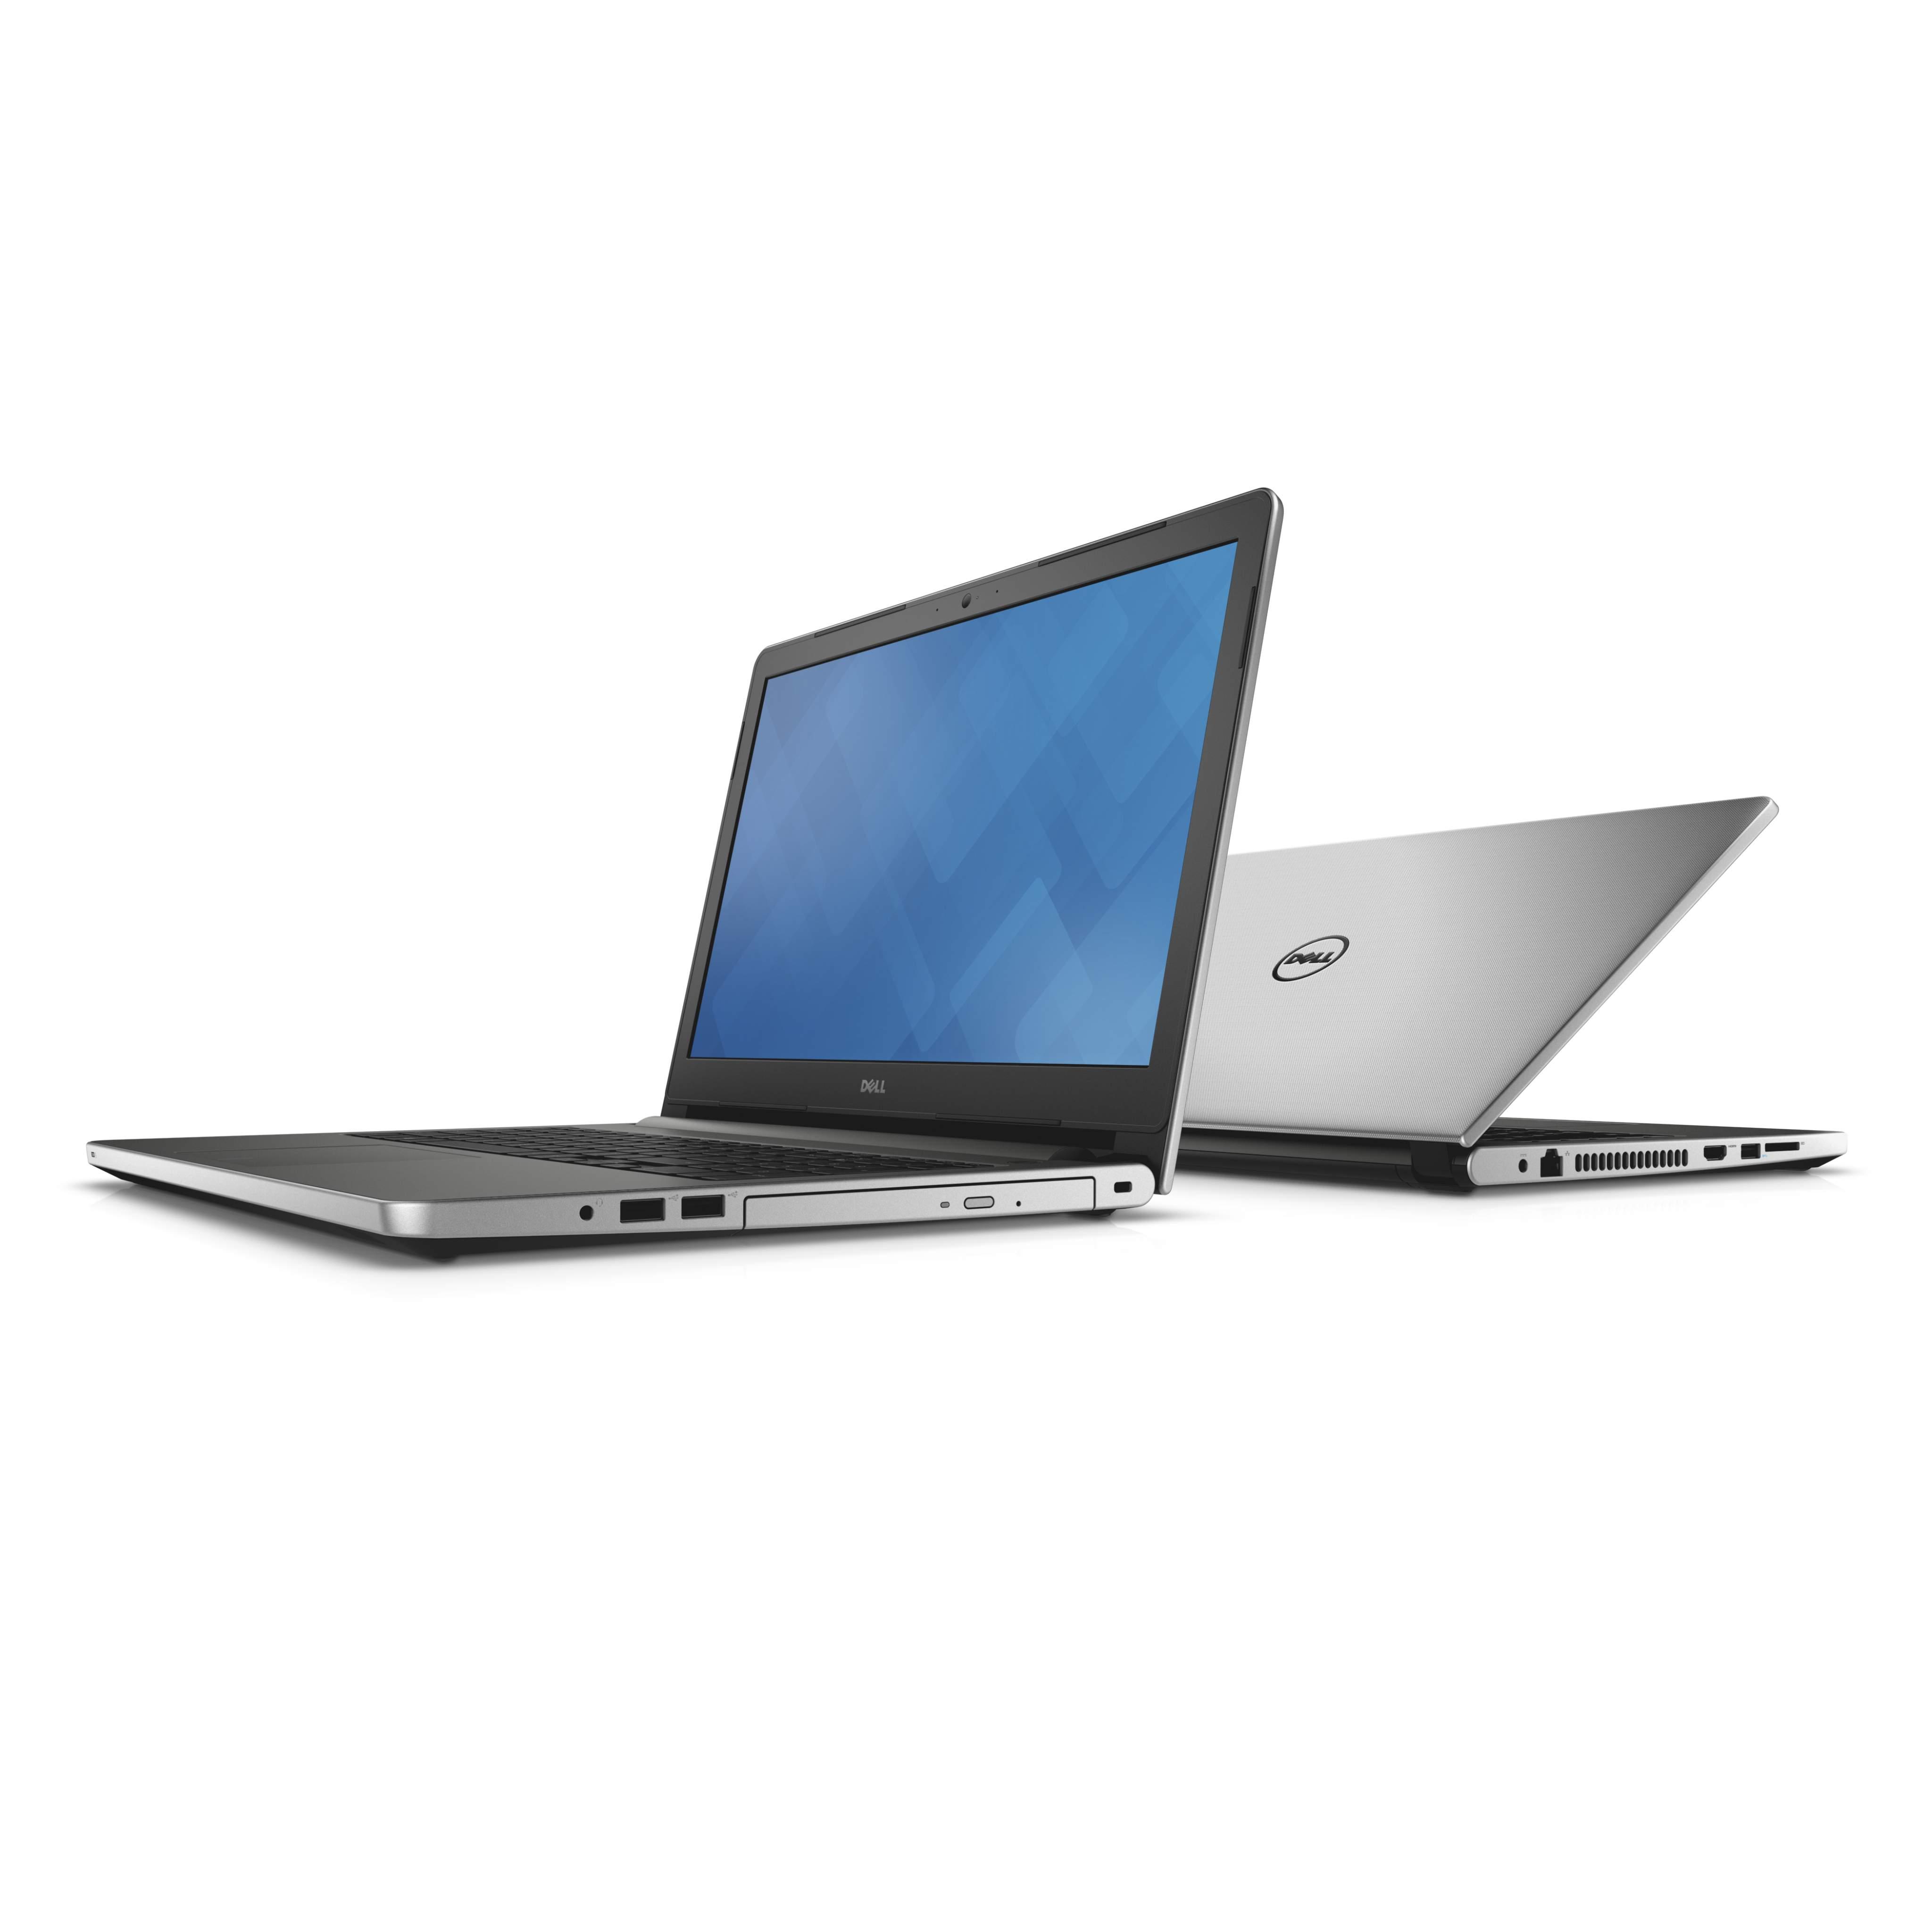 Dell Inspiron 5580 Dell Inspiron 5558 Dell Inspiron 5558 İnceleme 2 d 1